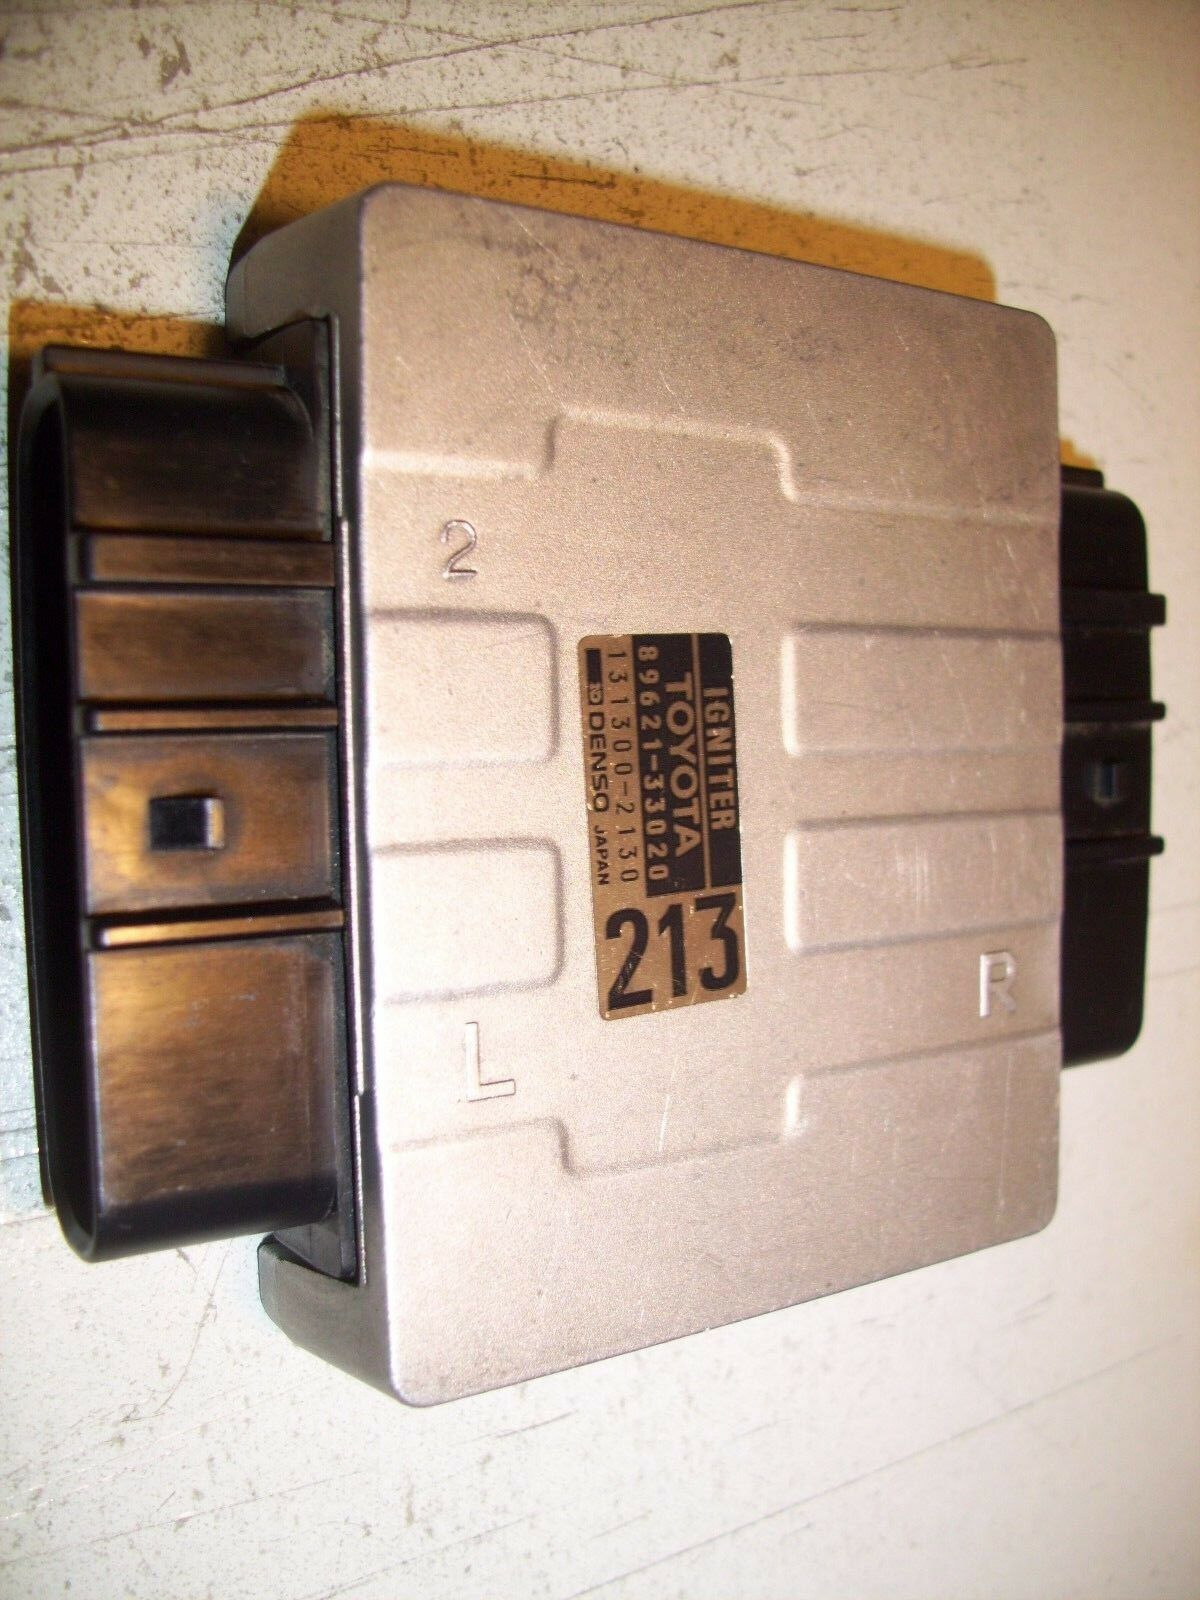 1995 TOYOTA Camry Igniter Module OEM 89621-33020 #9376